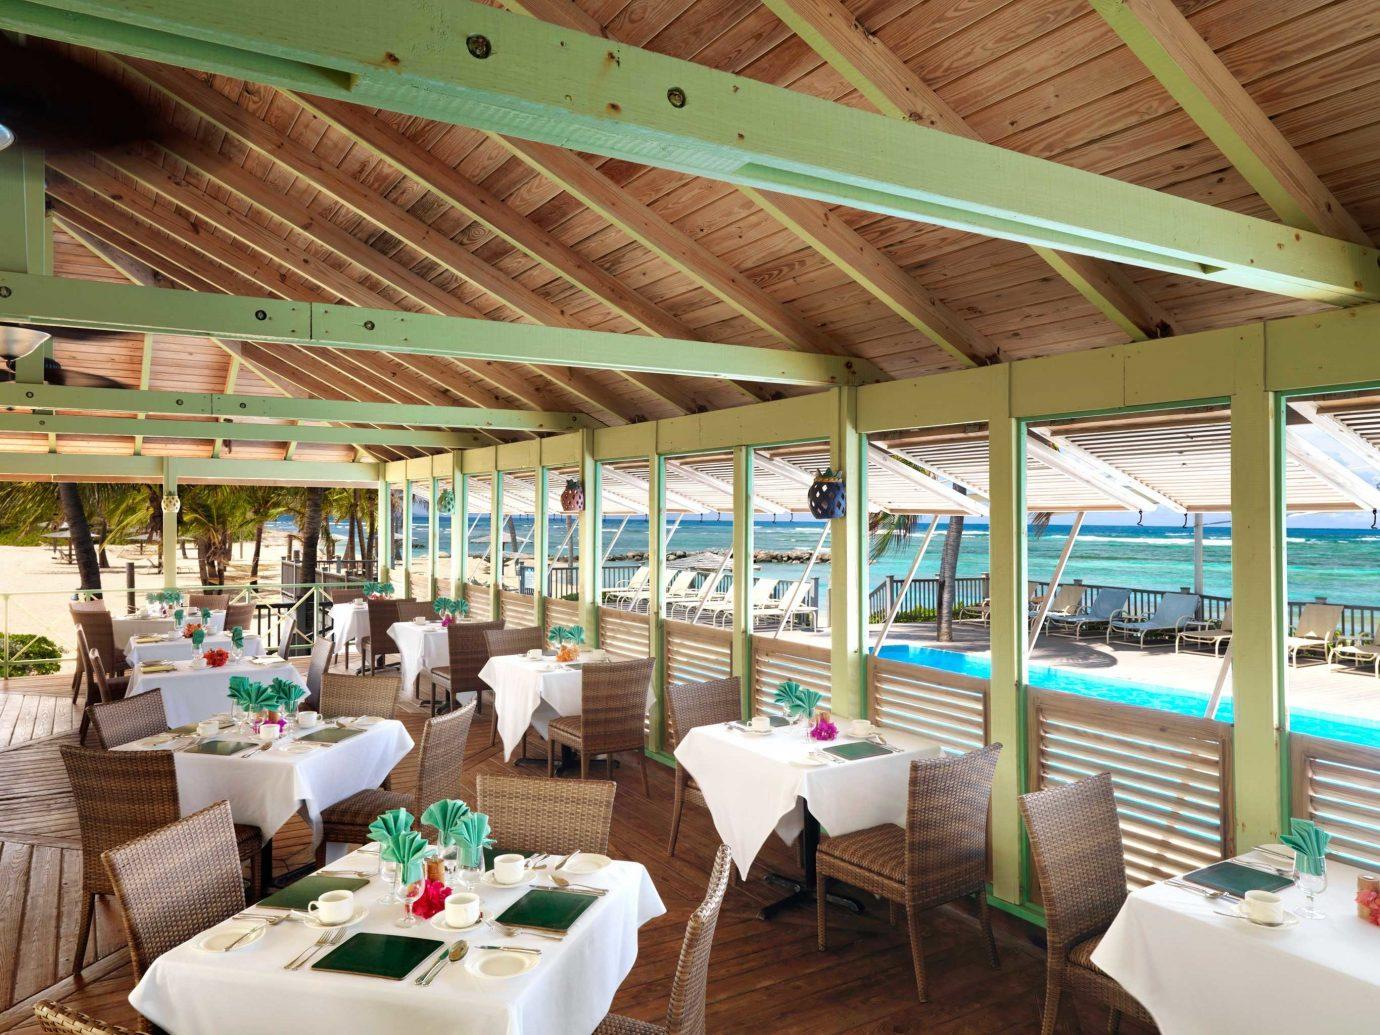 Bar Beach Beachfront Dining Drink Eat Islands Luxury Luxury Travel Scenic views Trip Ideas restaurant Resort